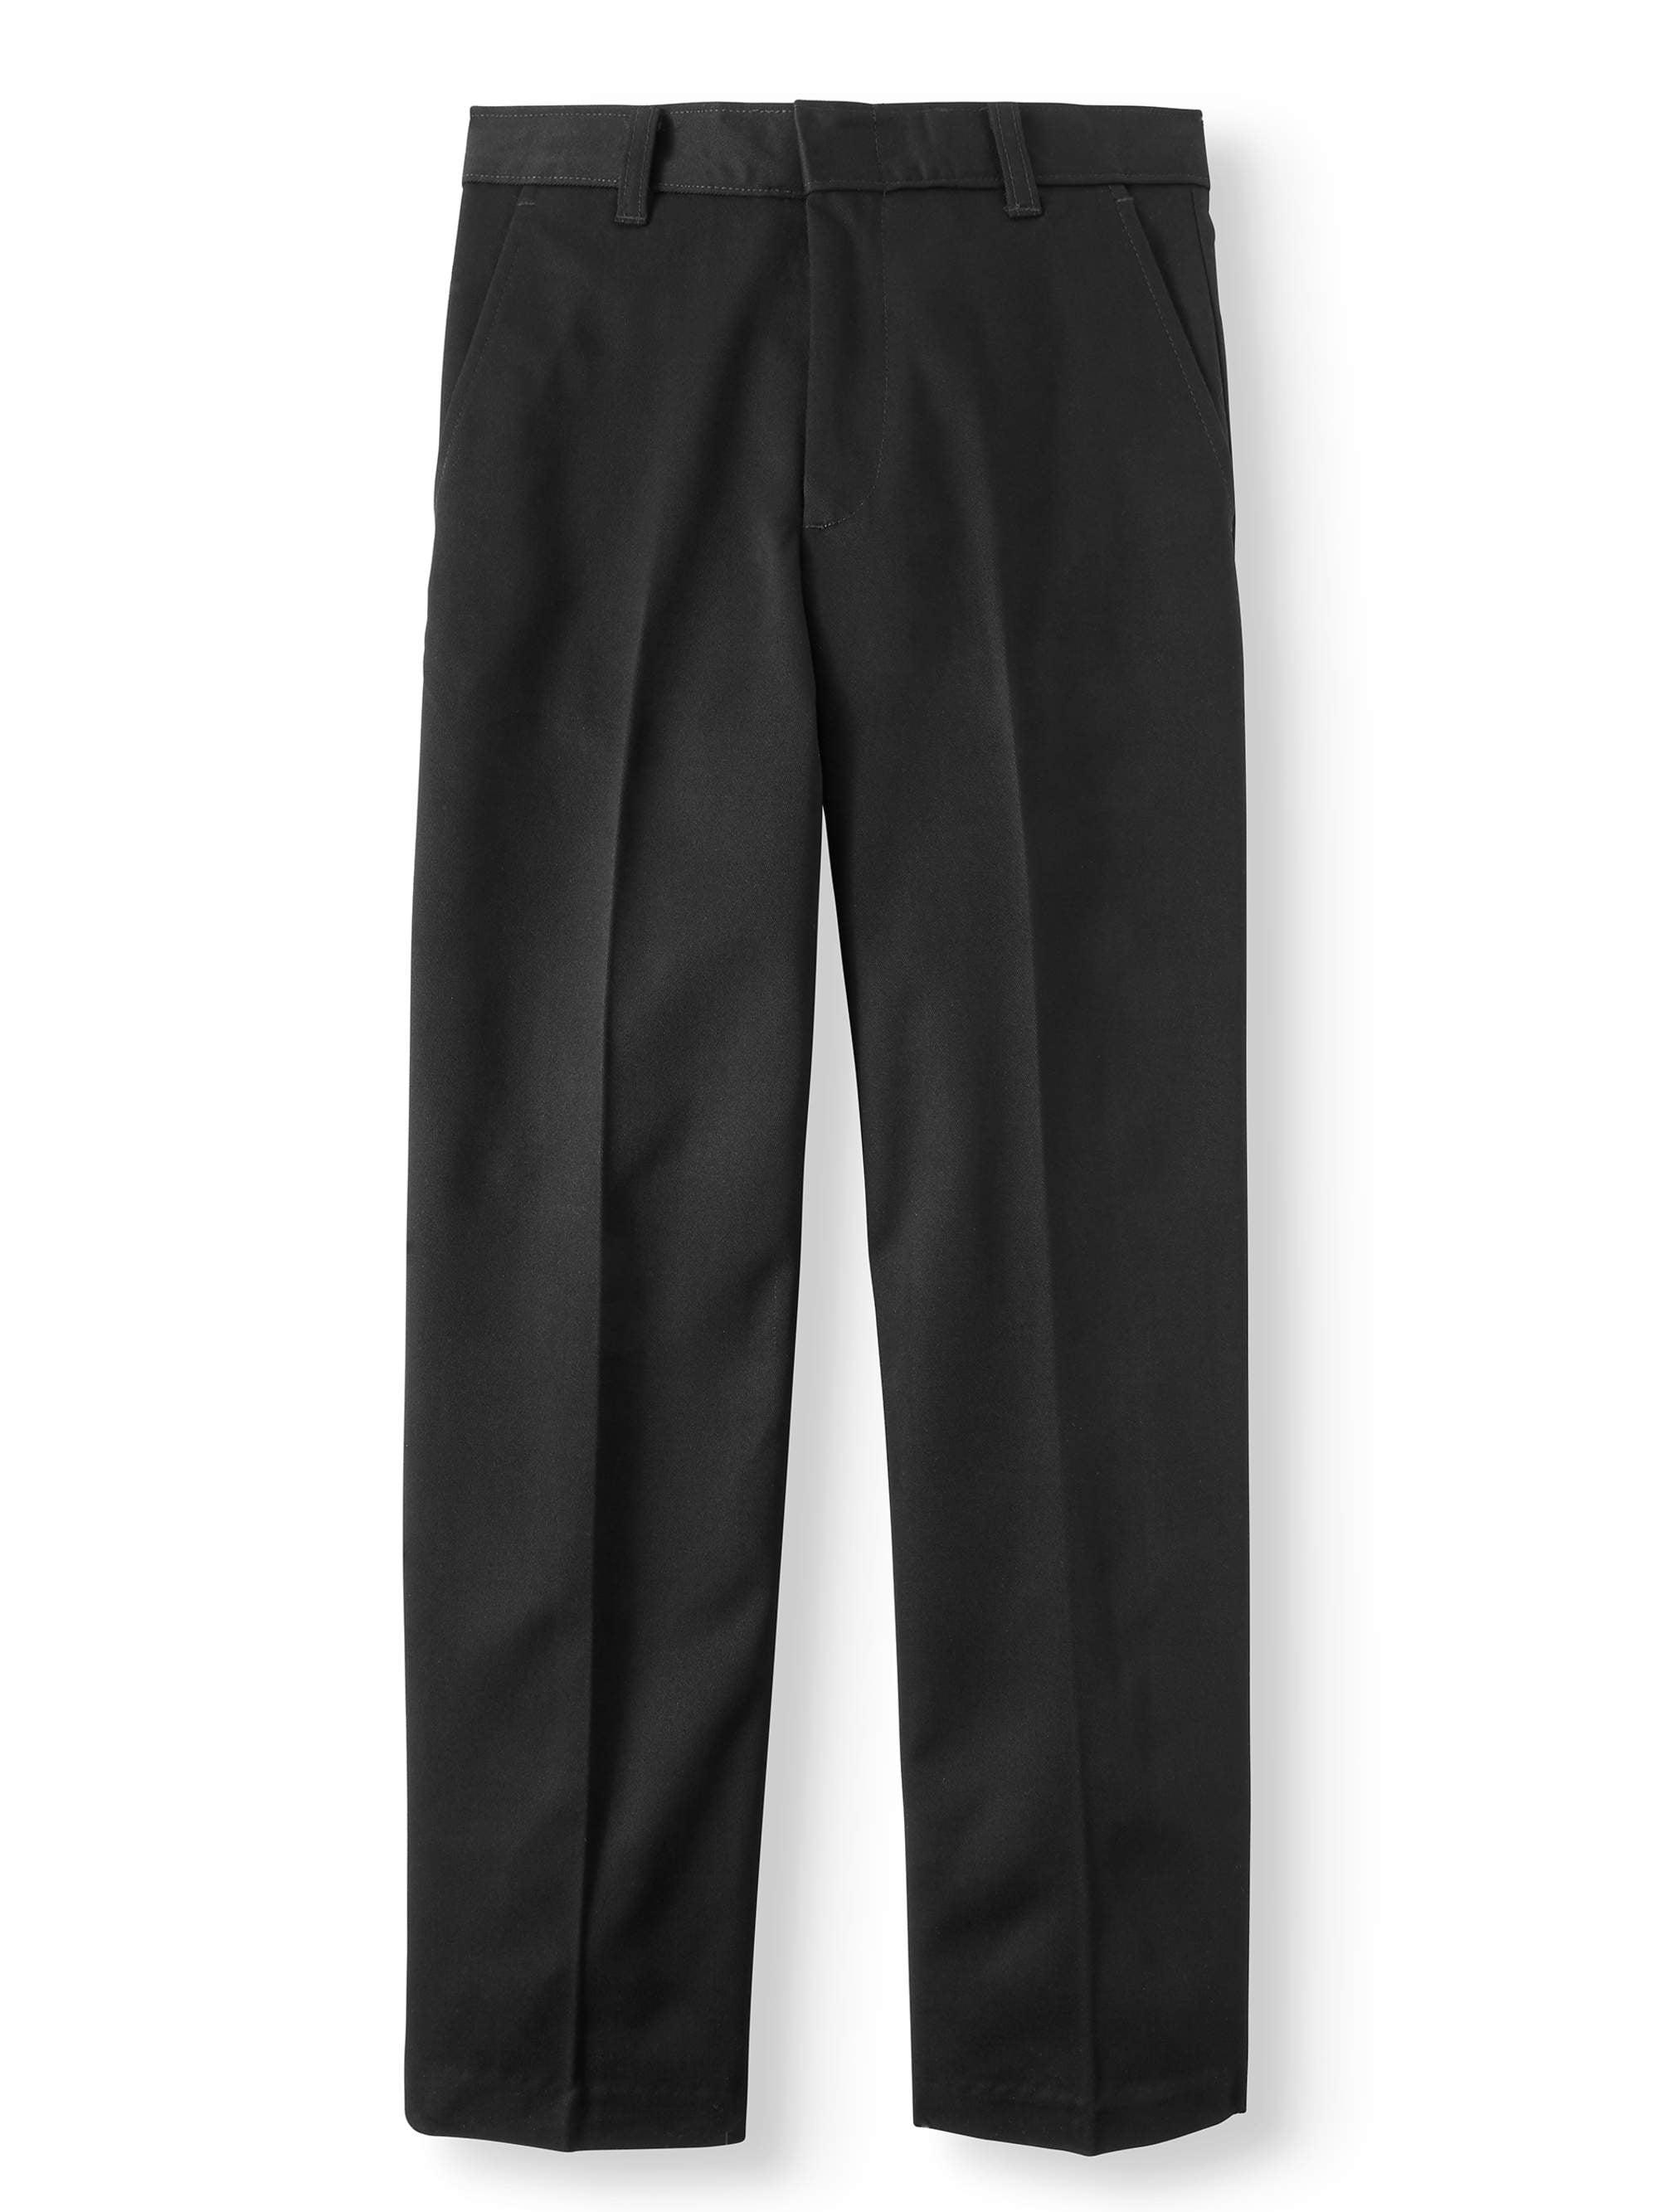 Boys School Uniforms Flat Front Pants